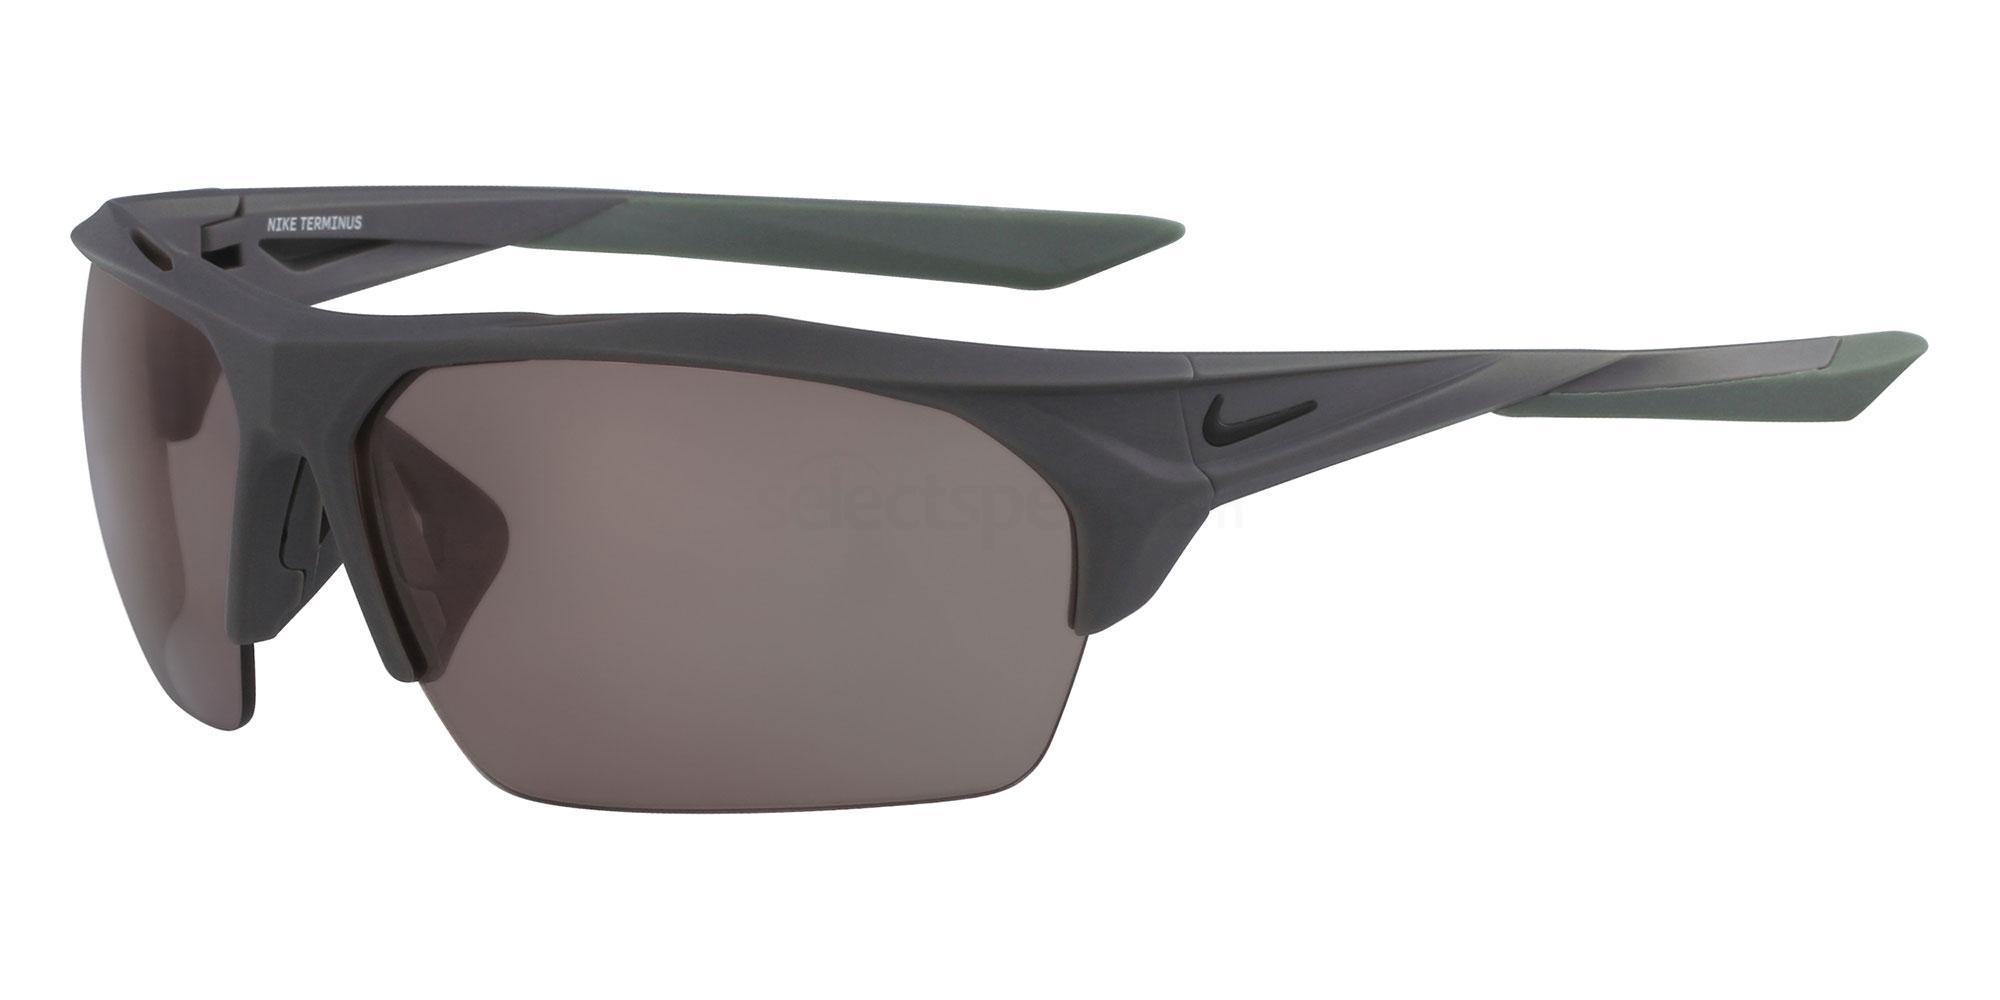 012 TERMINUS E EV1069 Sunglasses, Nike